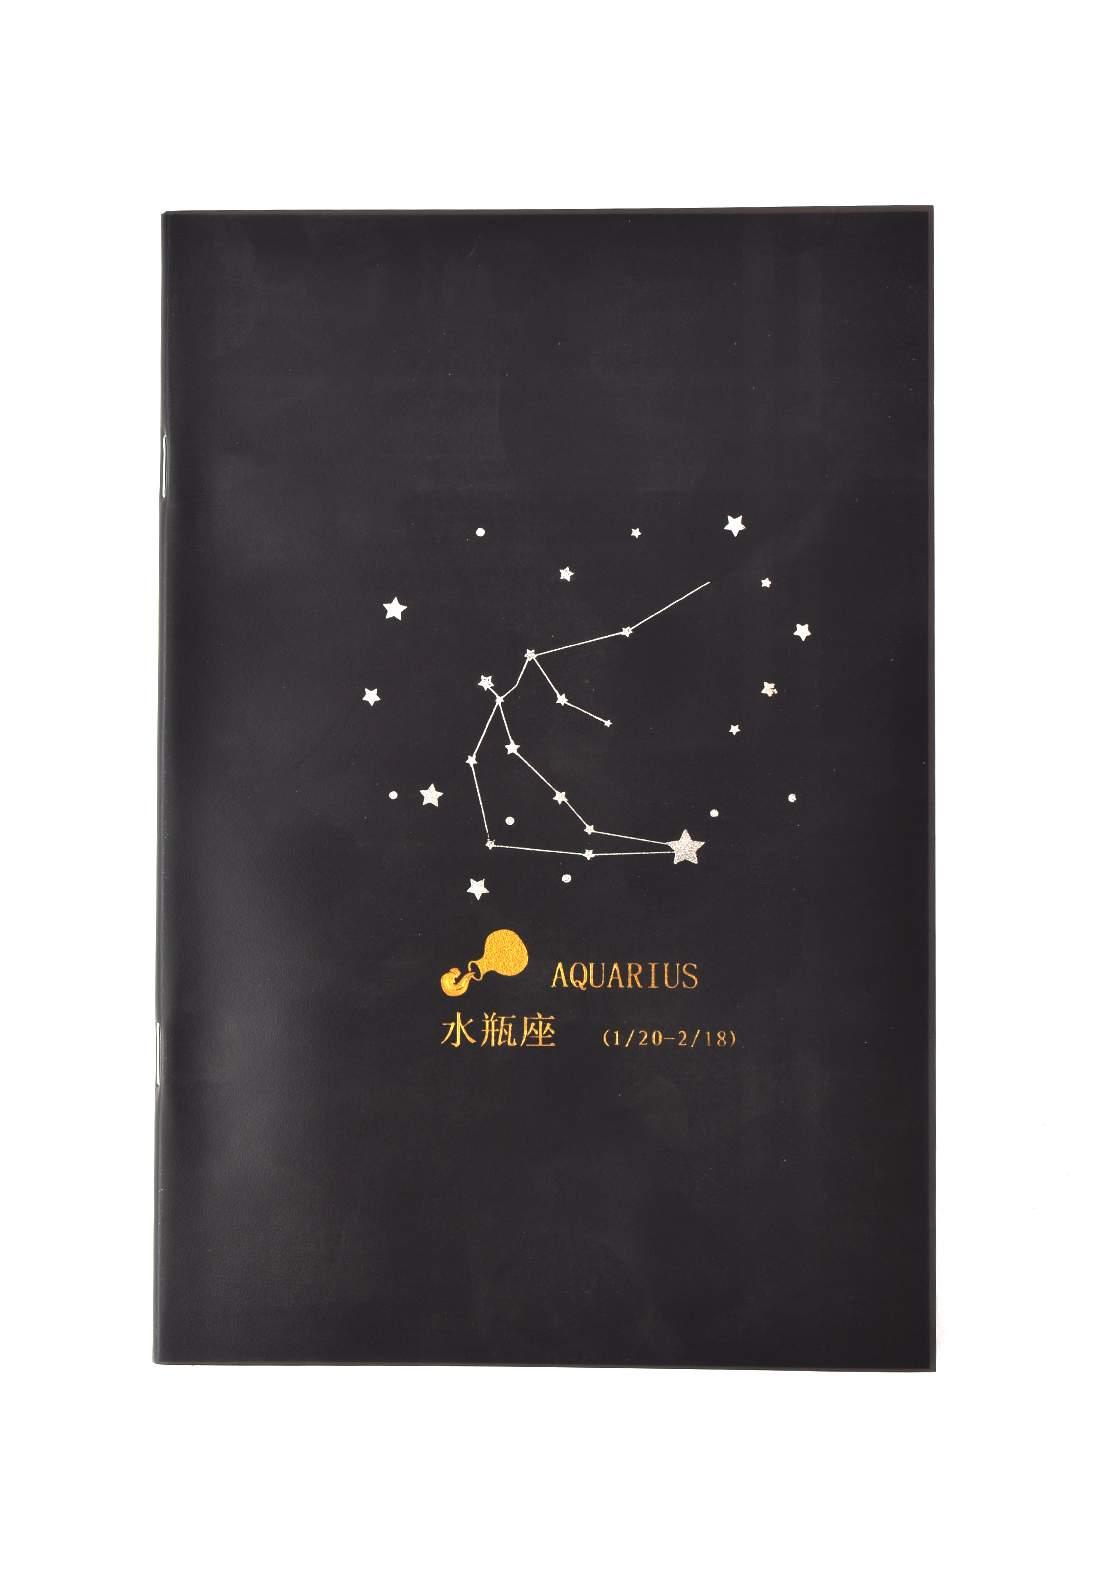 Small Black Drawing Book 24 Sheets-Aquarius دفتر رسم اسود صغير بطبعة برج الدلو